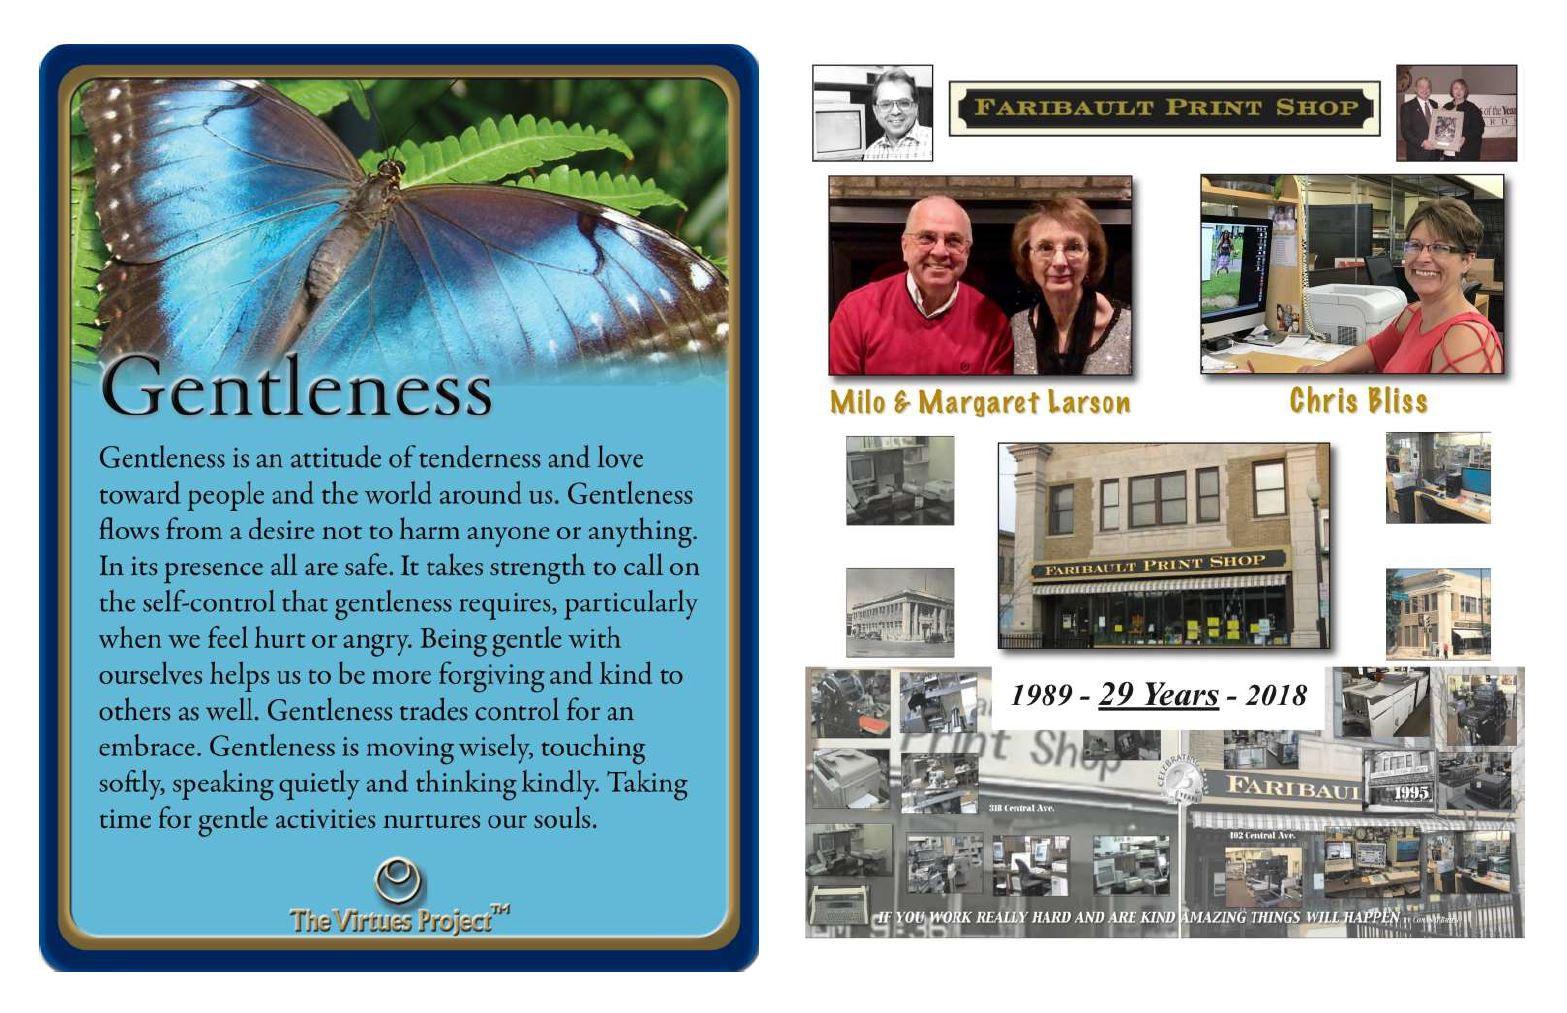 Faribautlt Print Shop Gentleness.JPG